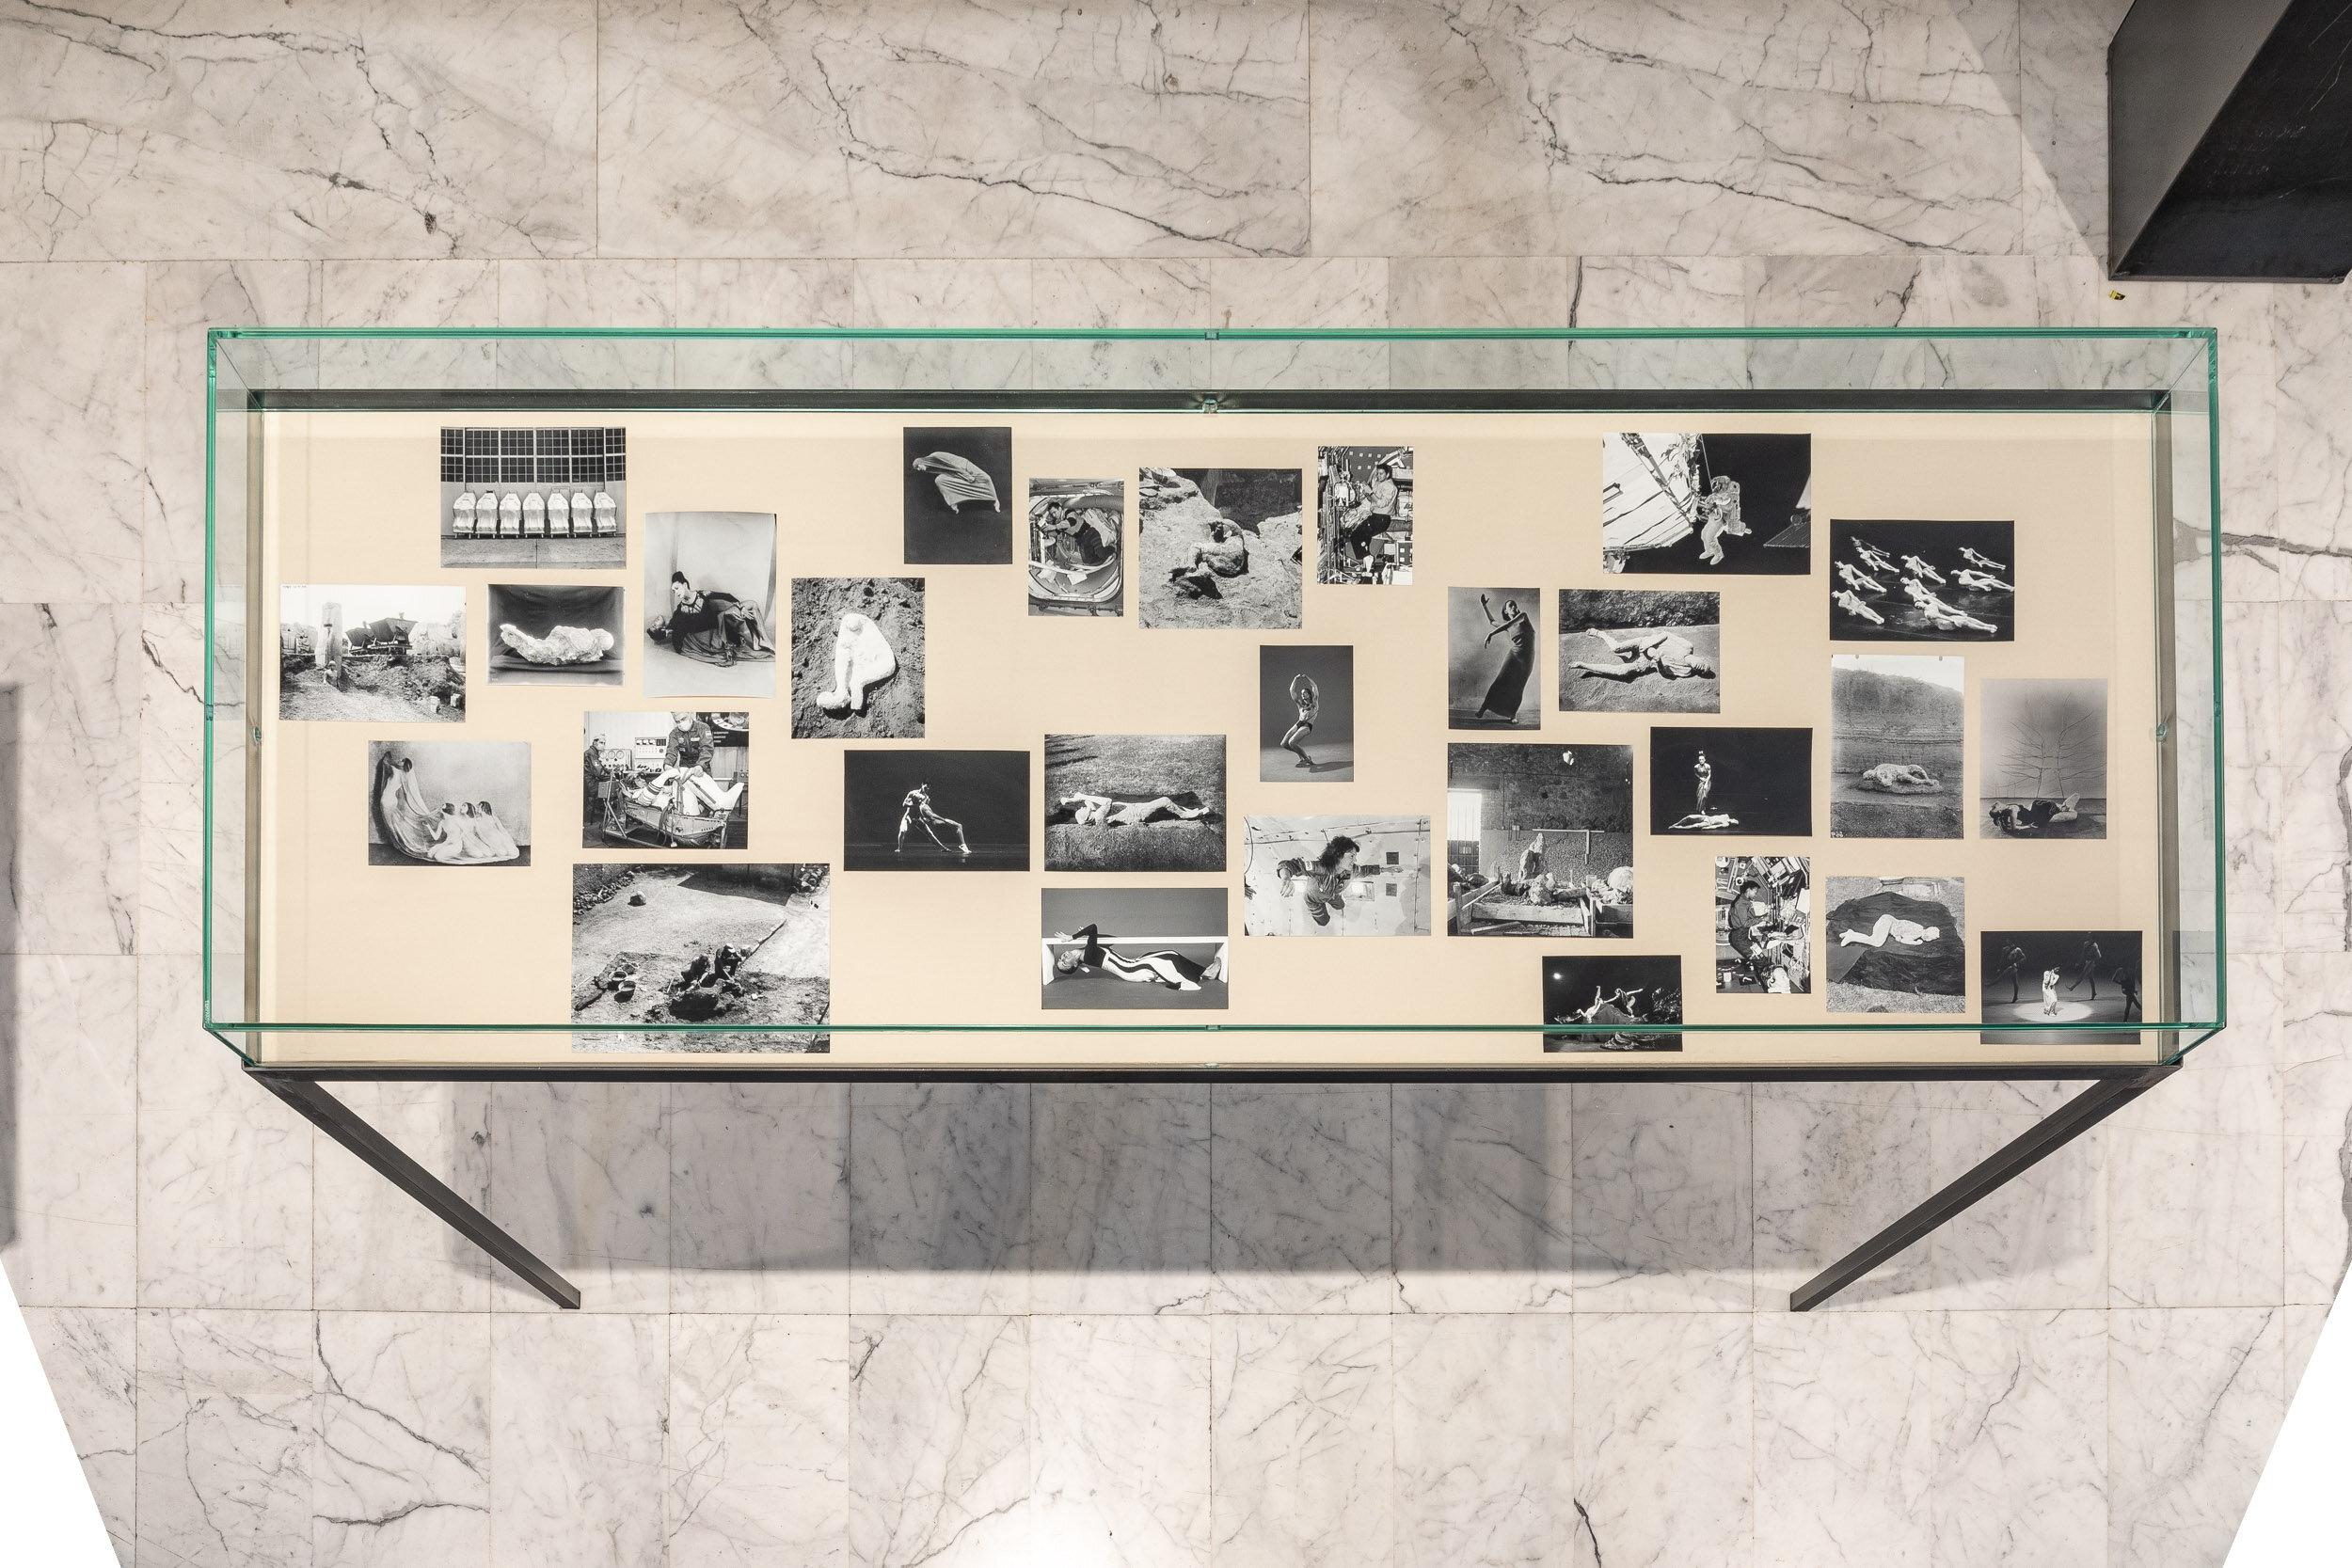 Attitude 2   Steel and glass vitrine, black and white photographs, fabric    100 x 210 x 75 cm    2019